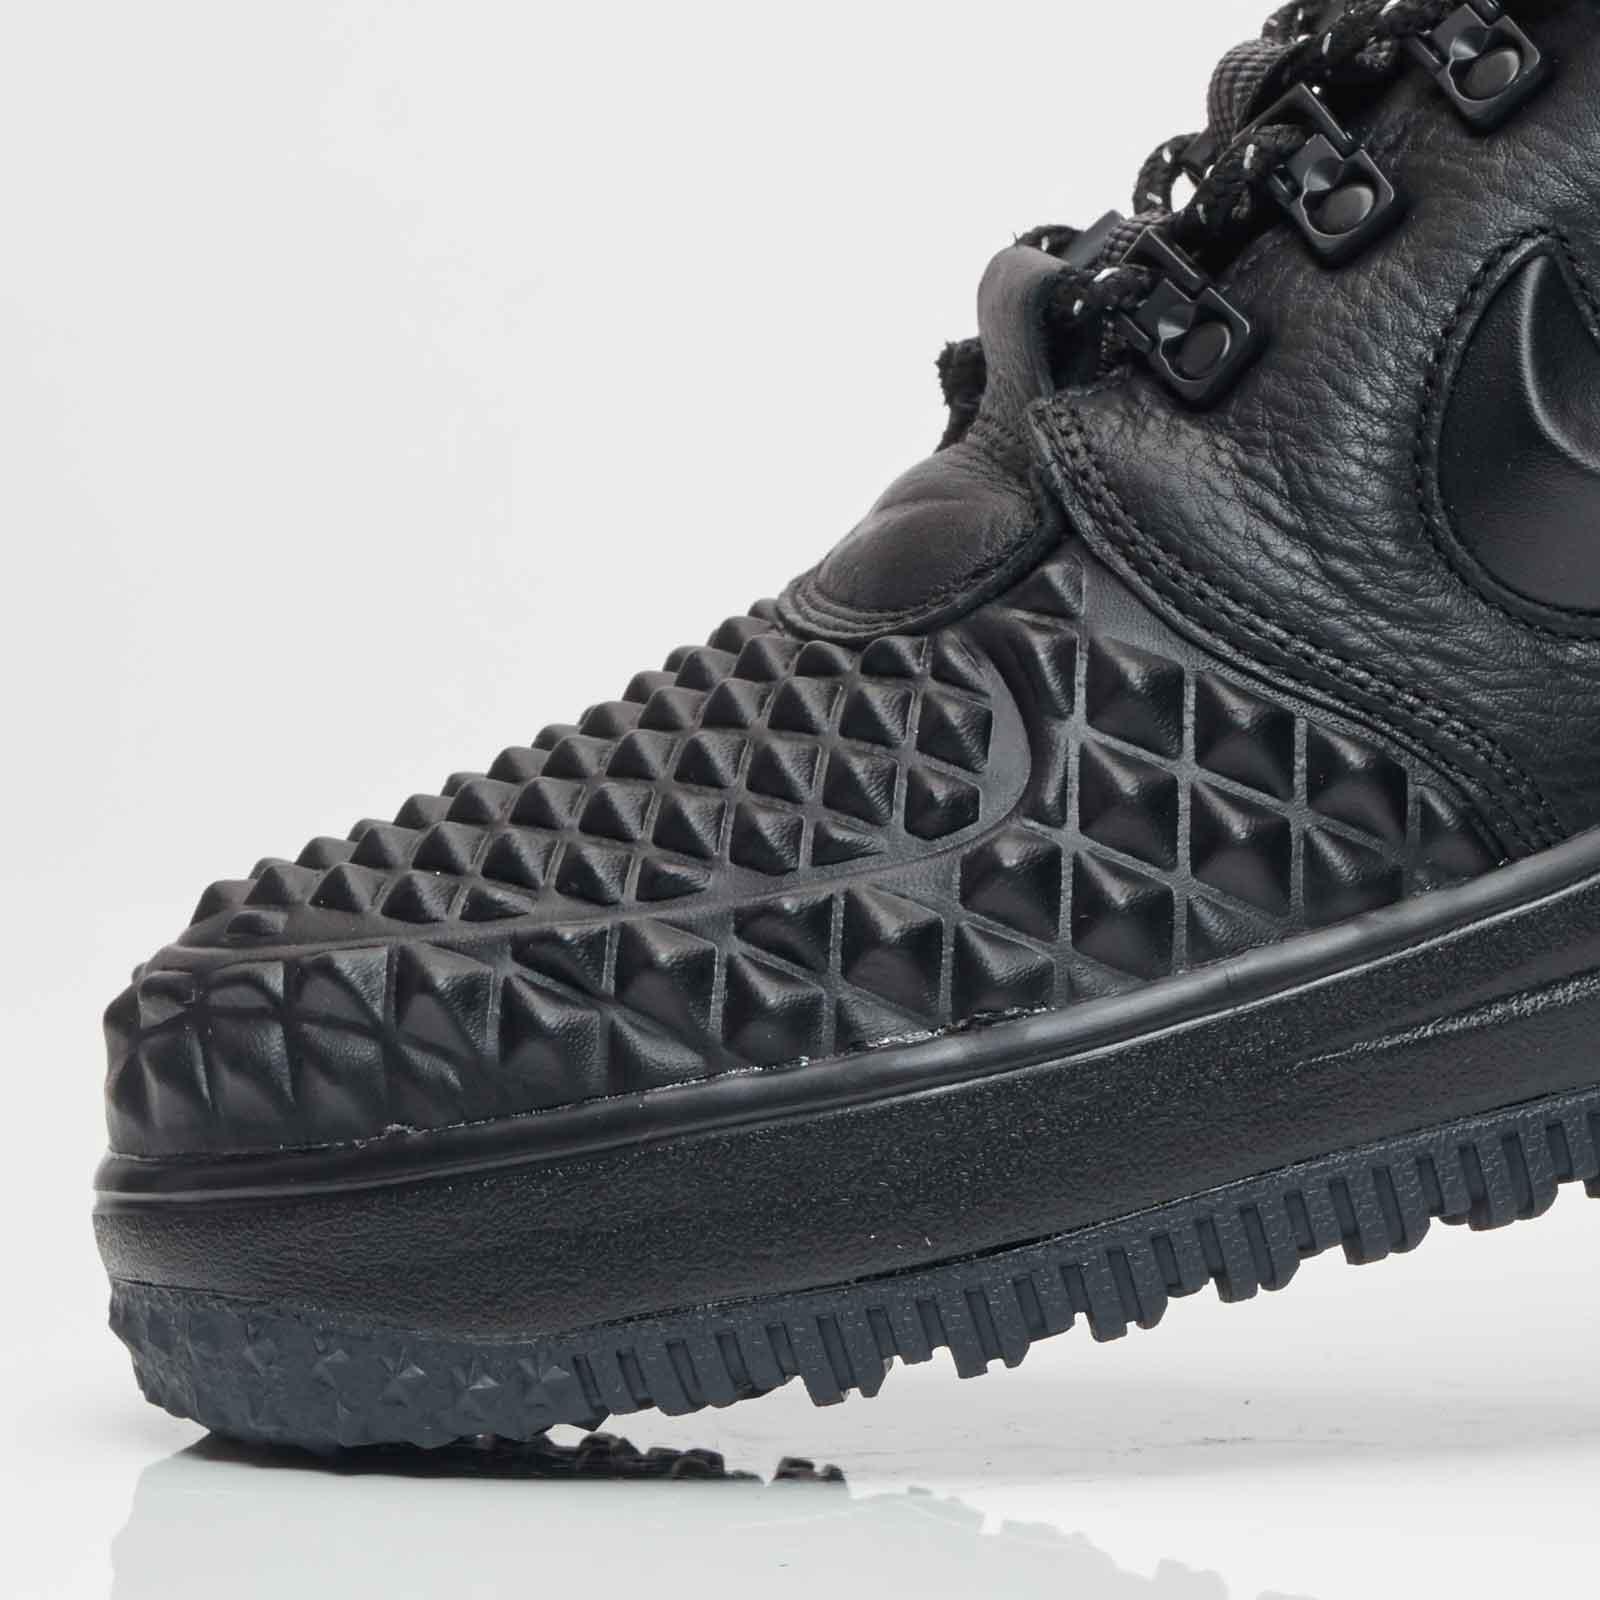 Nike Wmns LF1 Duckboot - Aa0283-001